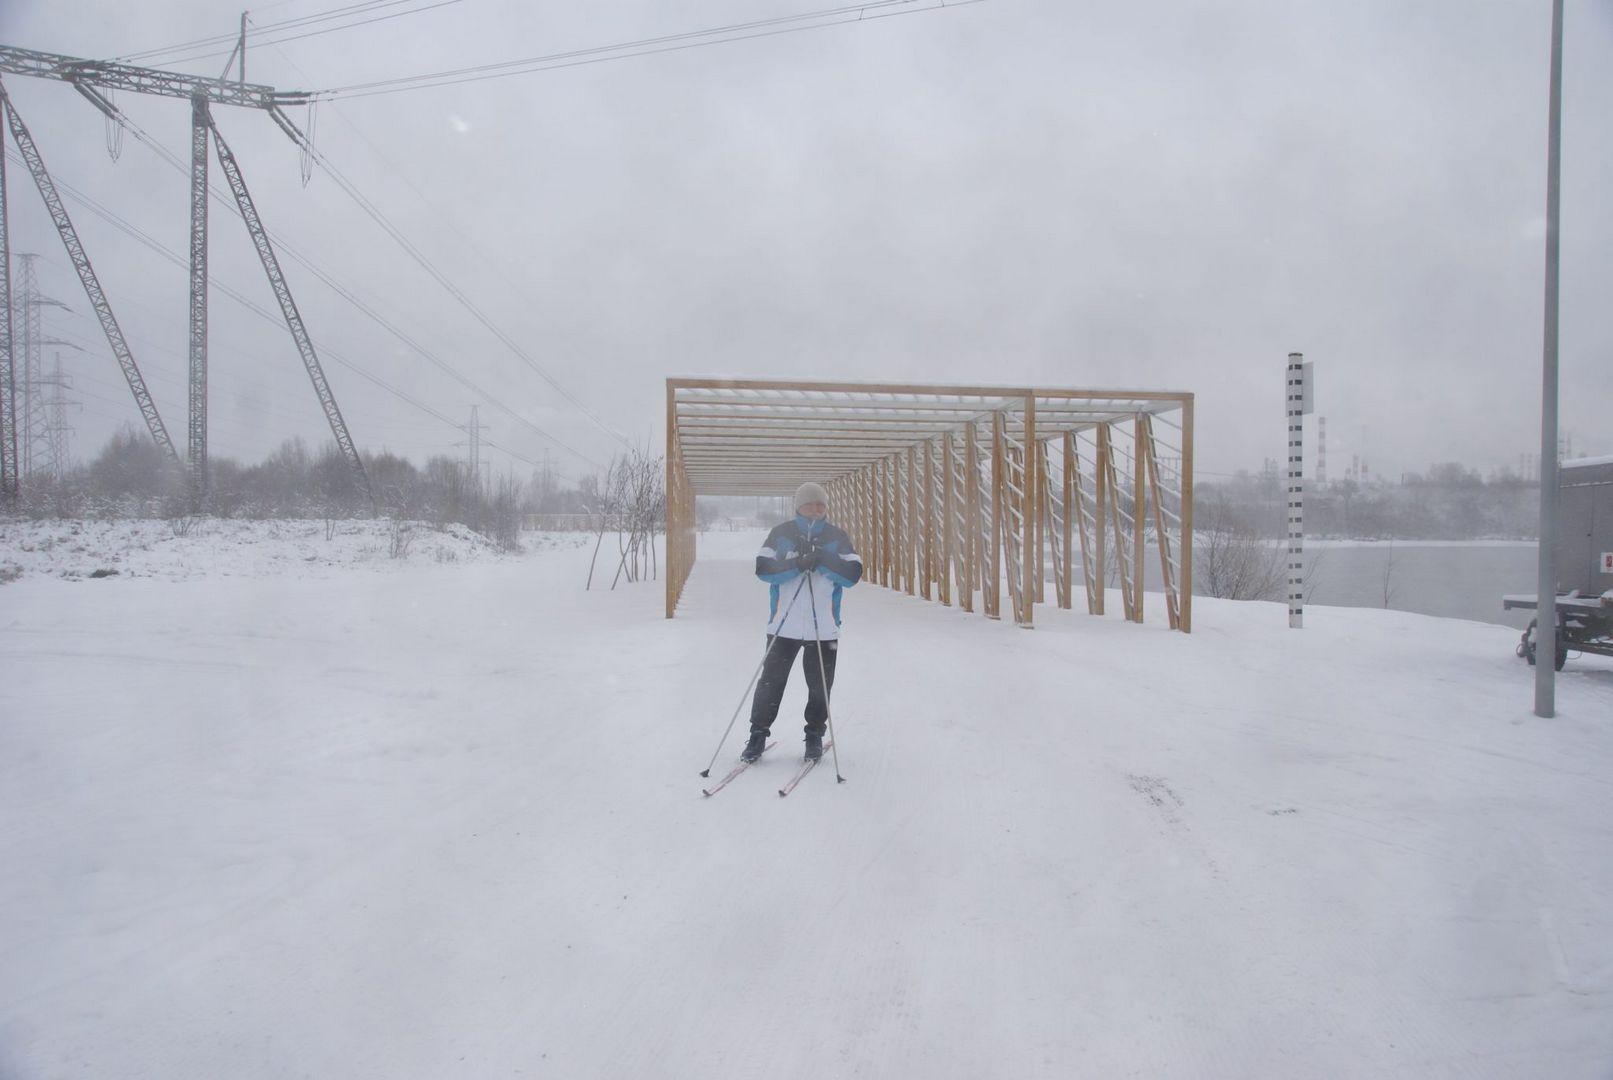 7 лыжных школ